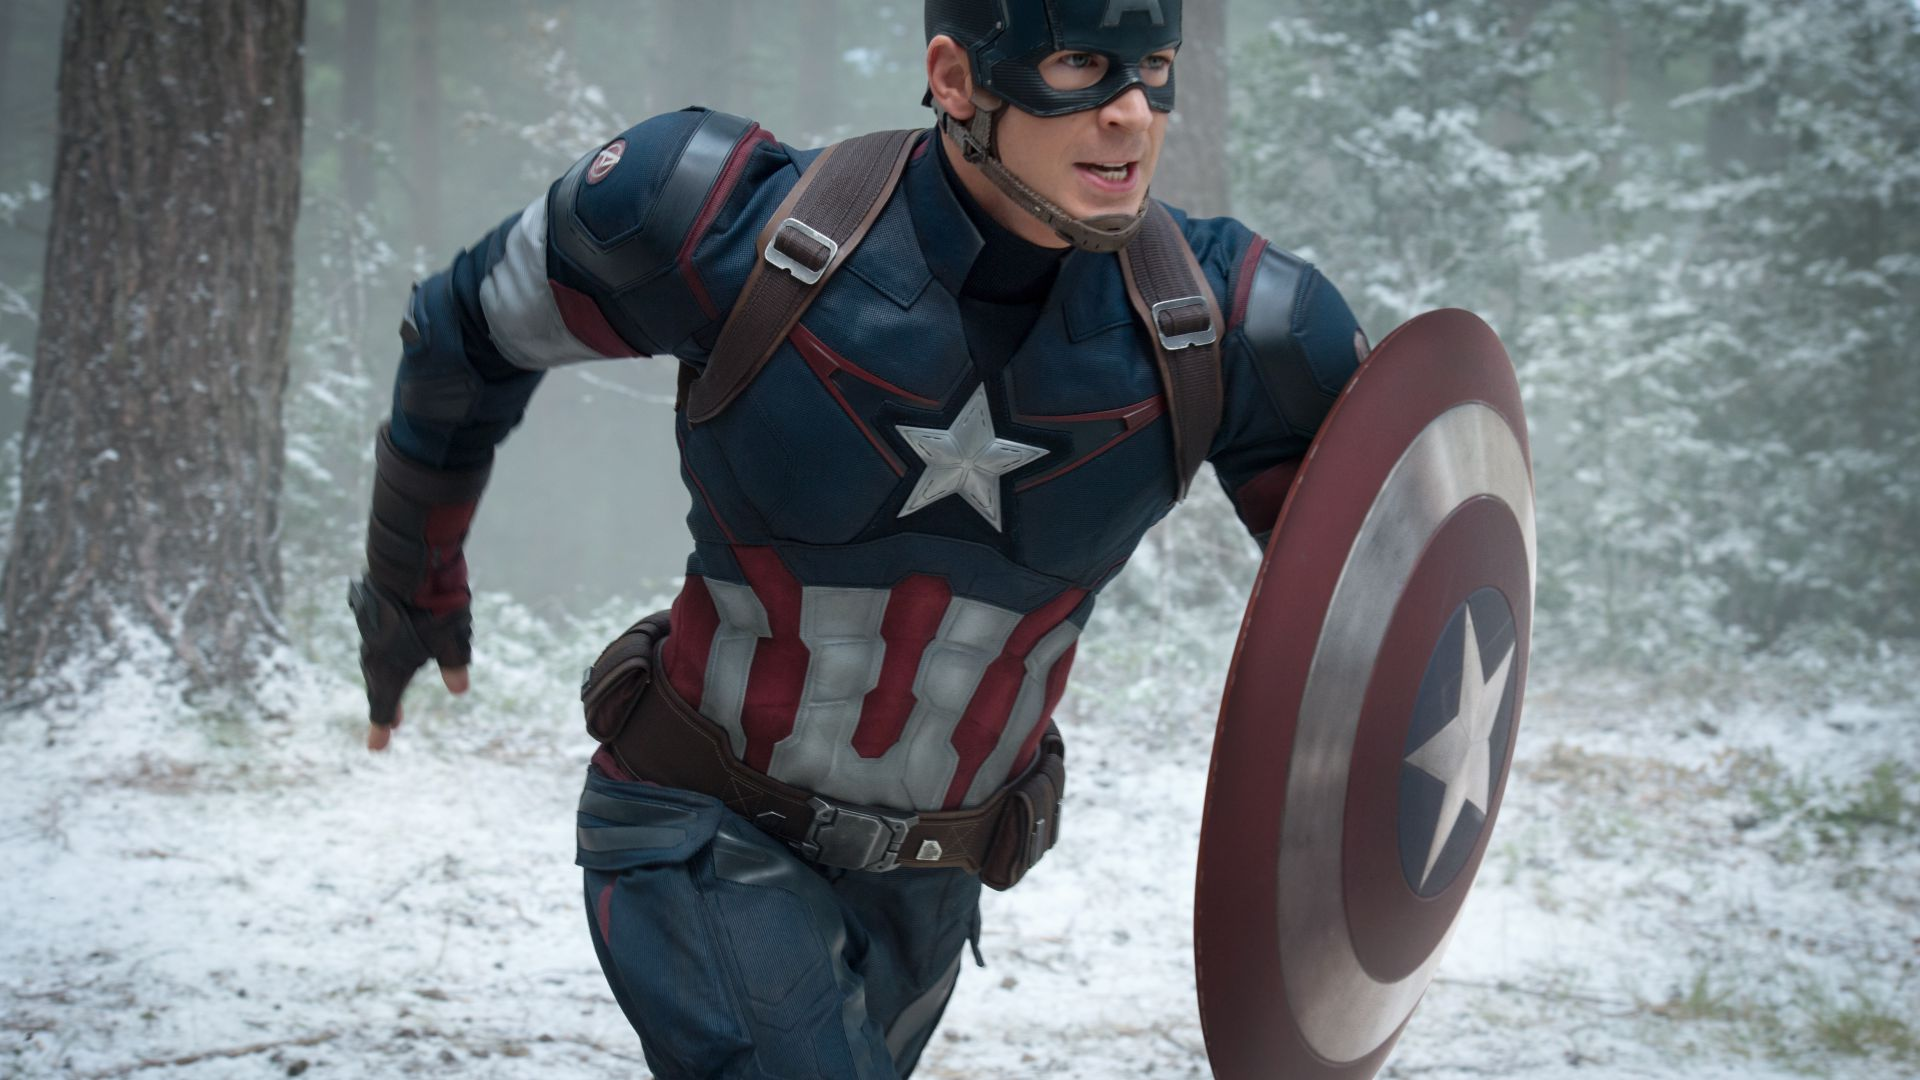 Обои Крис эванс, chris evans, мстители, steve rogers, captain america, the avengers. Фильмы foto 18